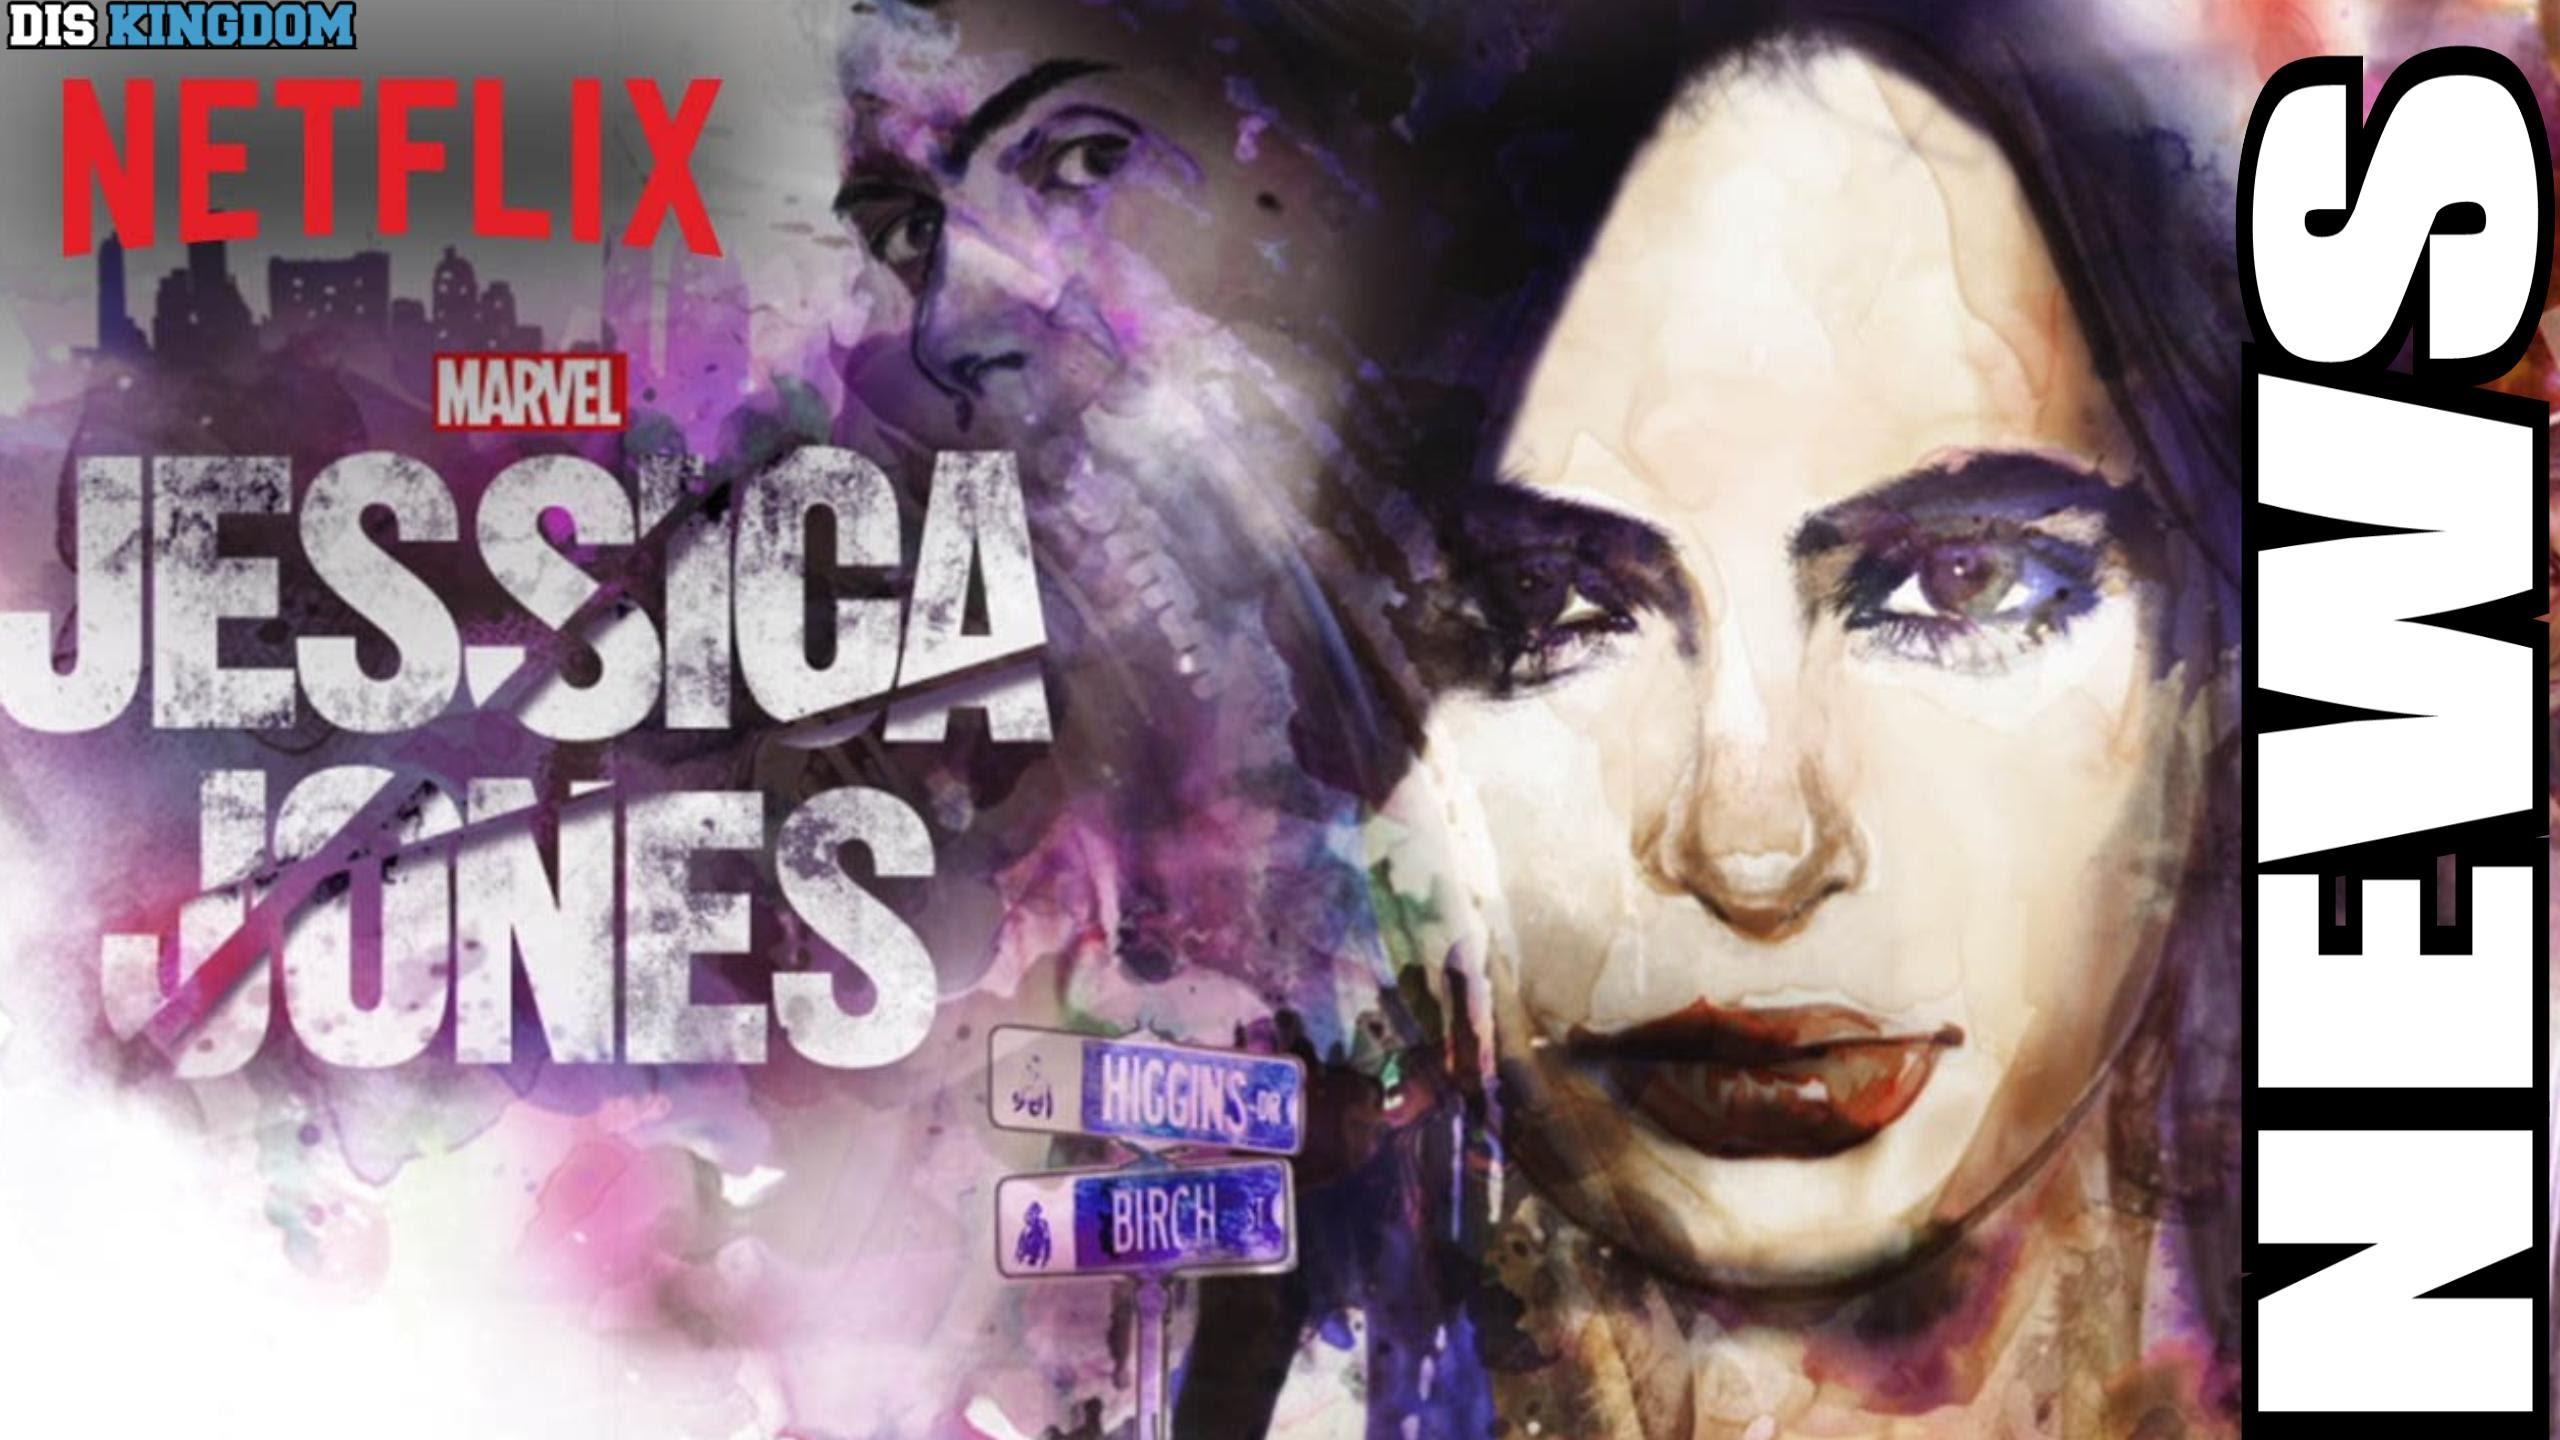 Marvel's Jessica Jones Returning To Netflix For Season 2